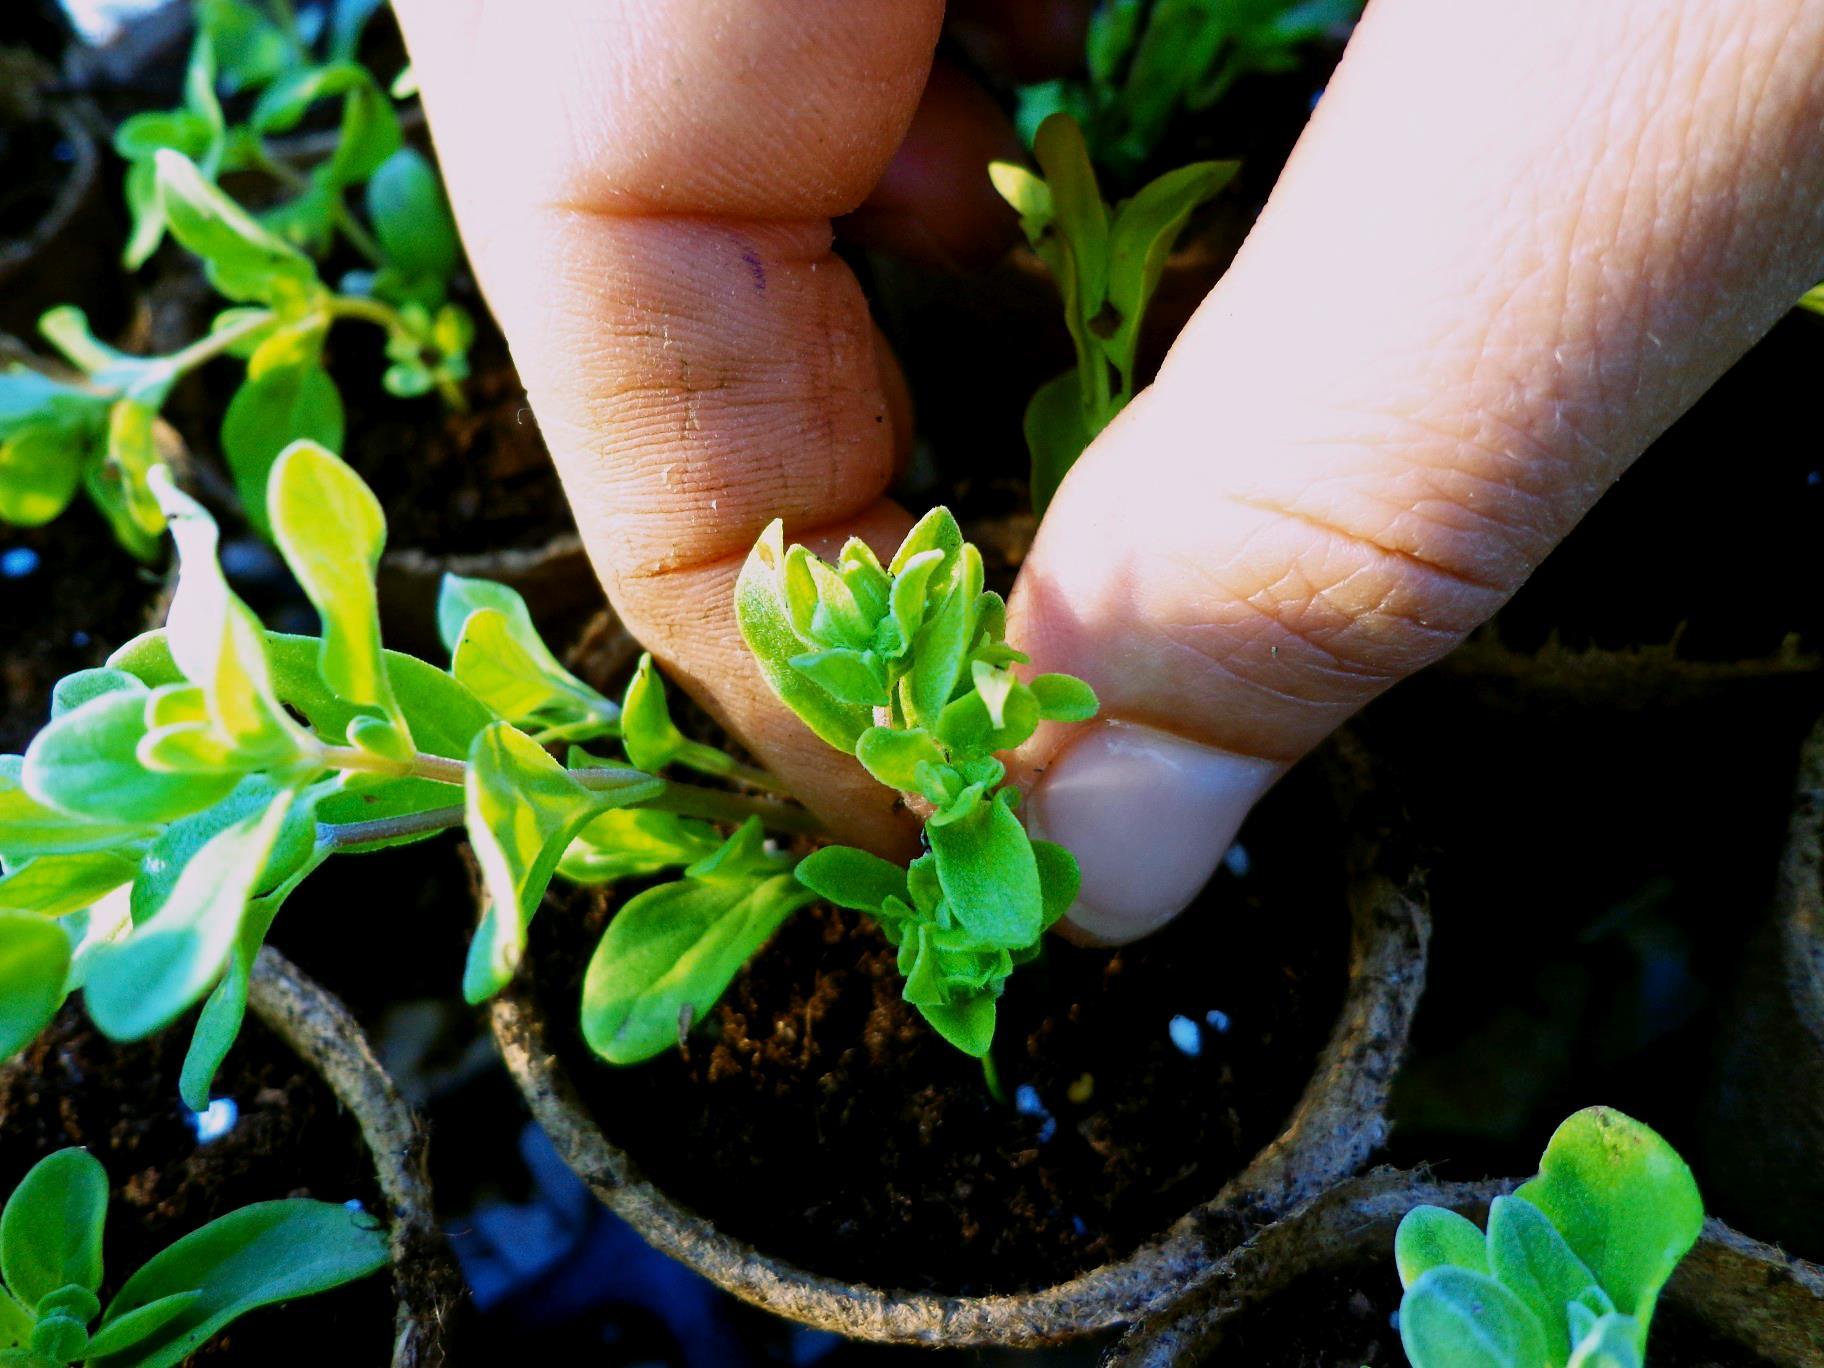 Workshop o cultivo de ervas arom ticas em casa portal - Cultivo de hierbas aromaticas en casa ...